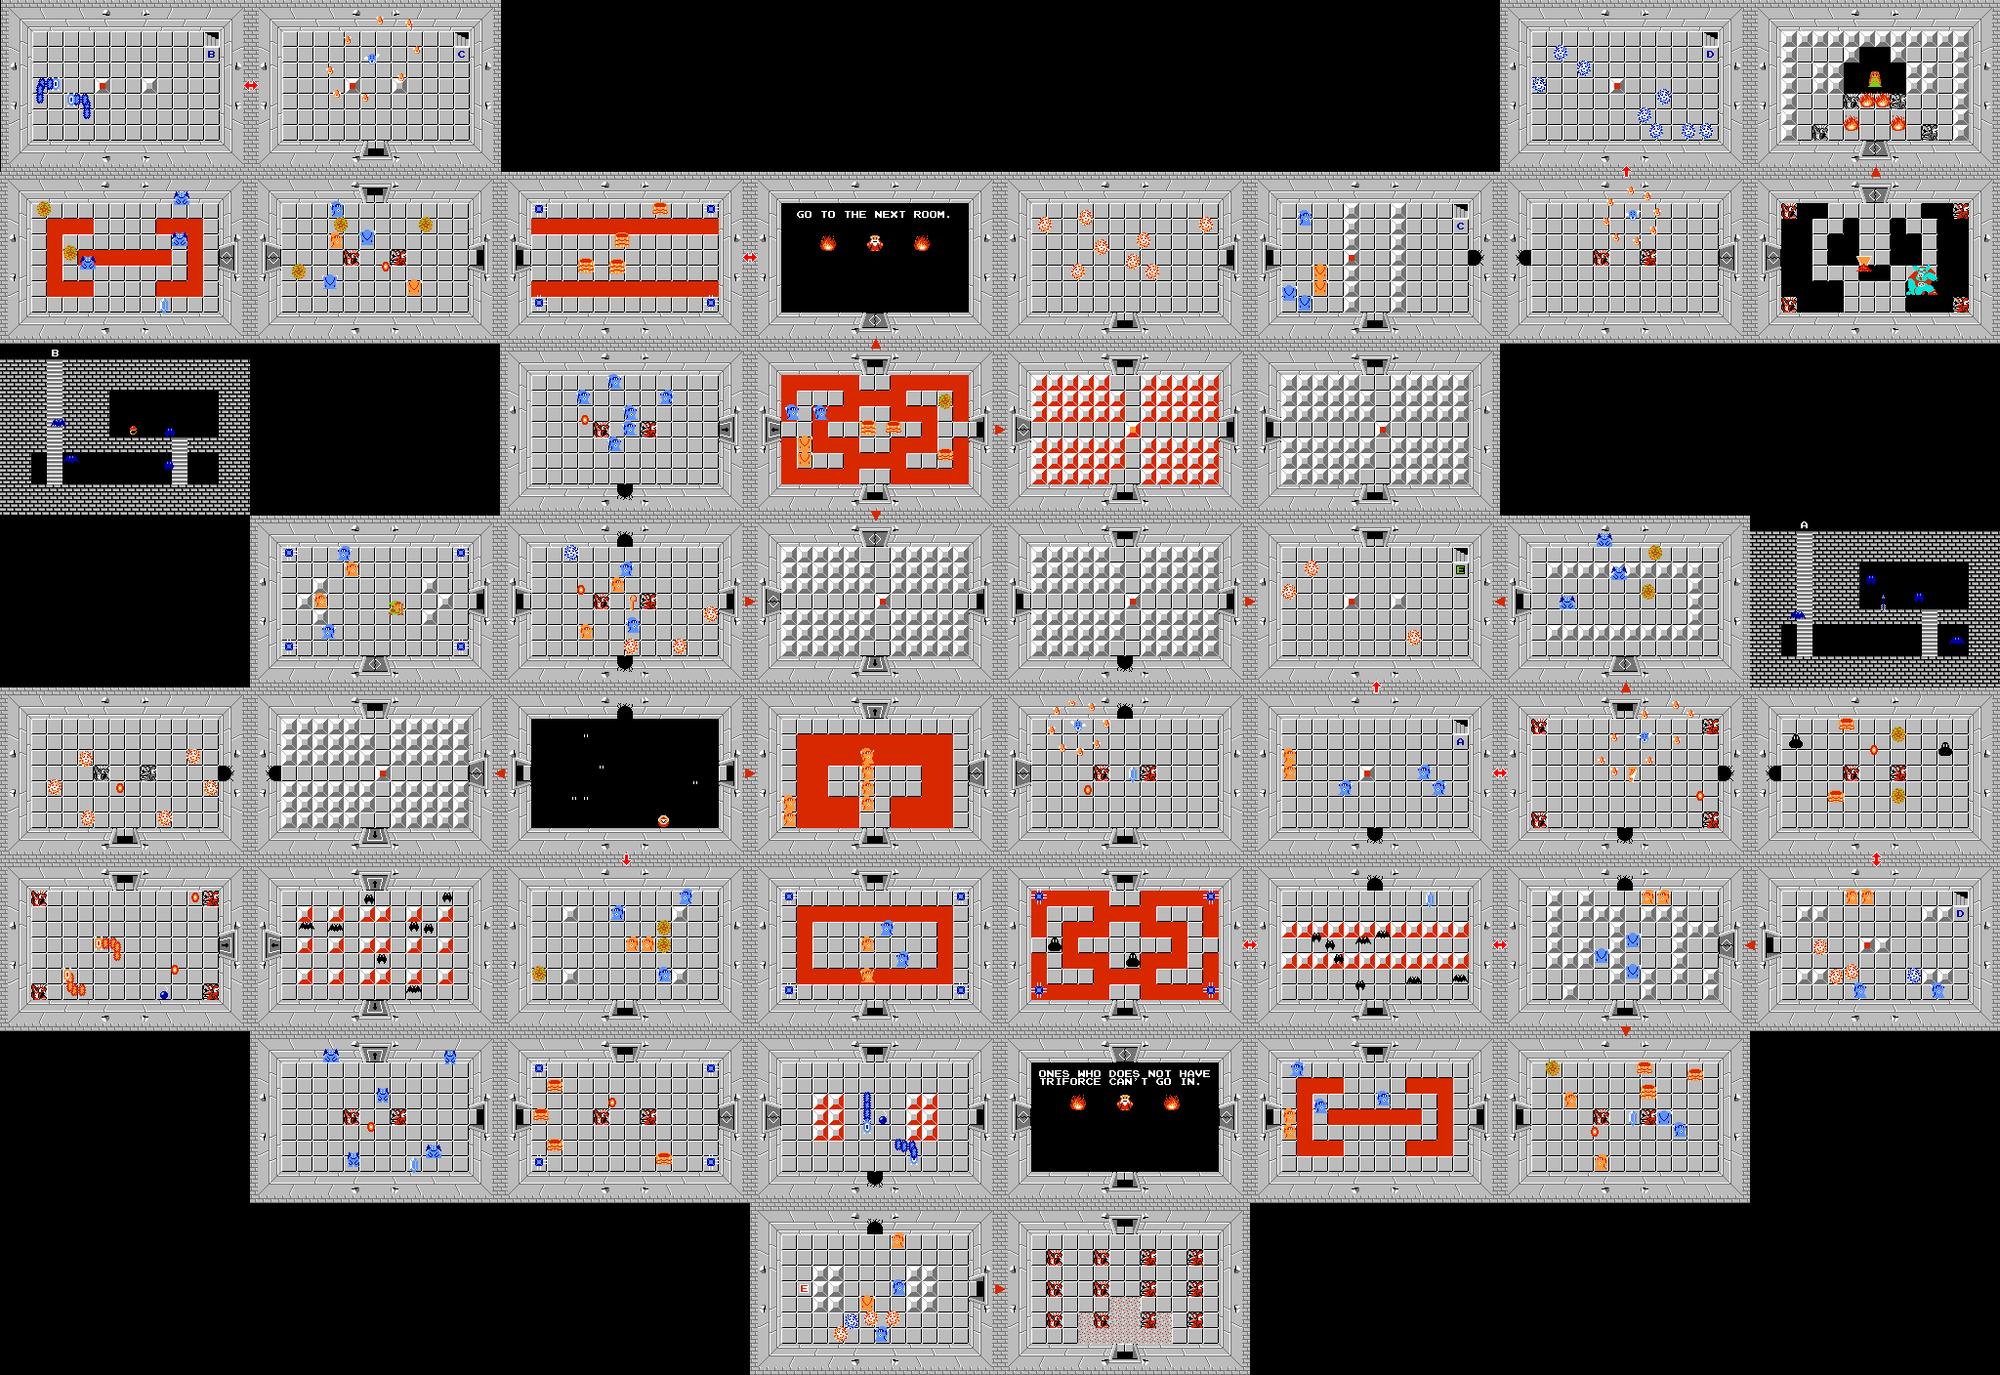 Level 9 (Second Quest) | Zeldapedia | FANDOM powered by Wikia